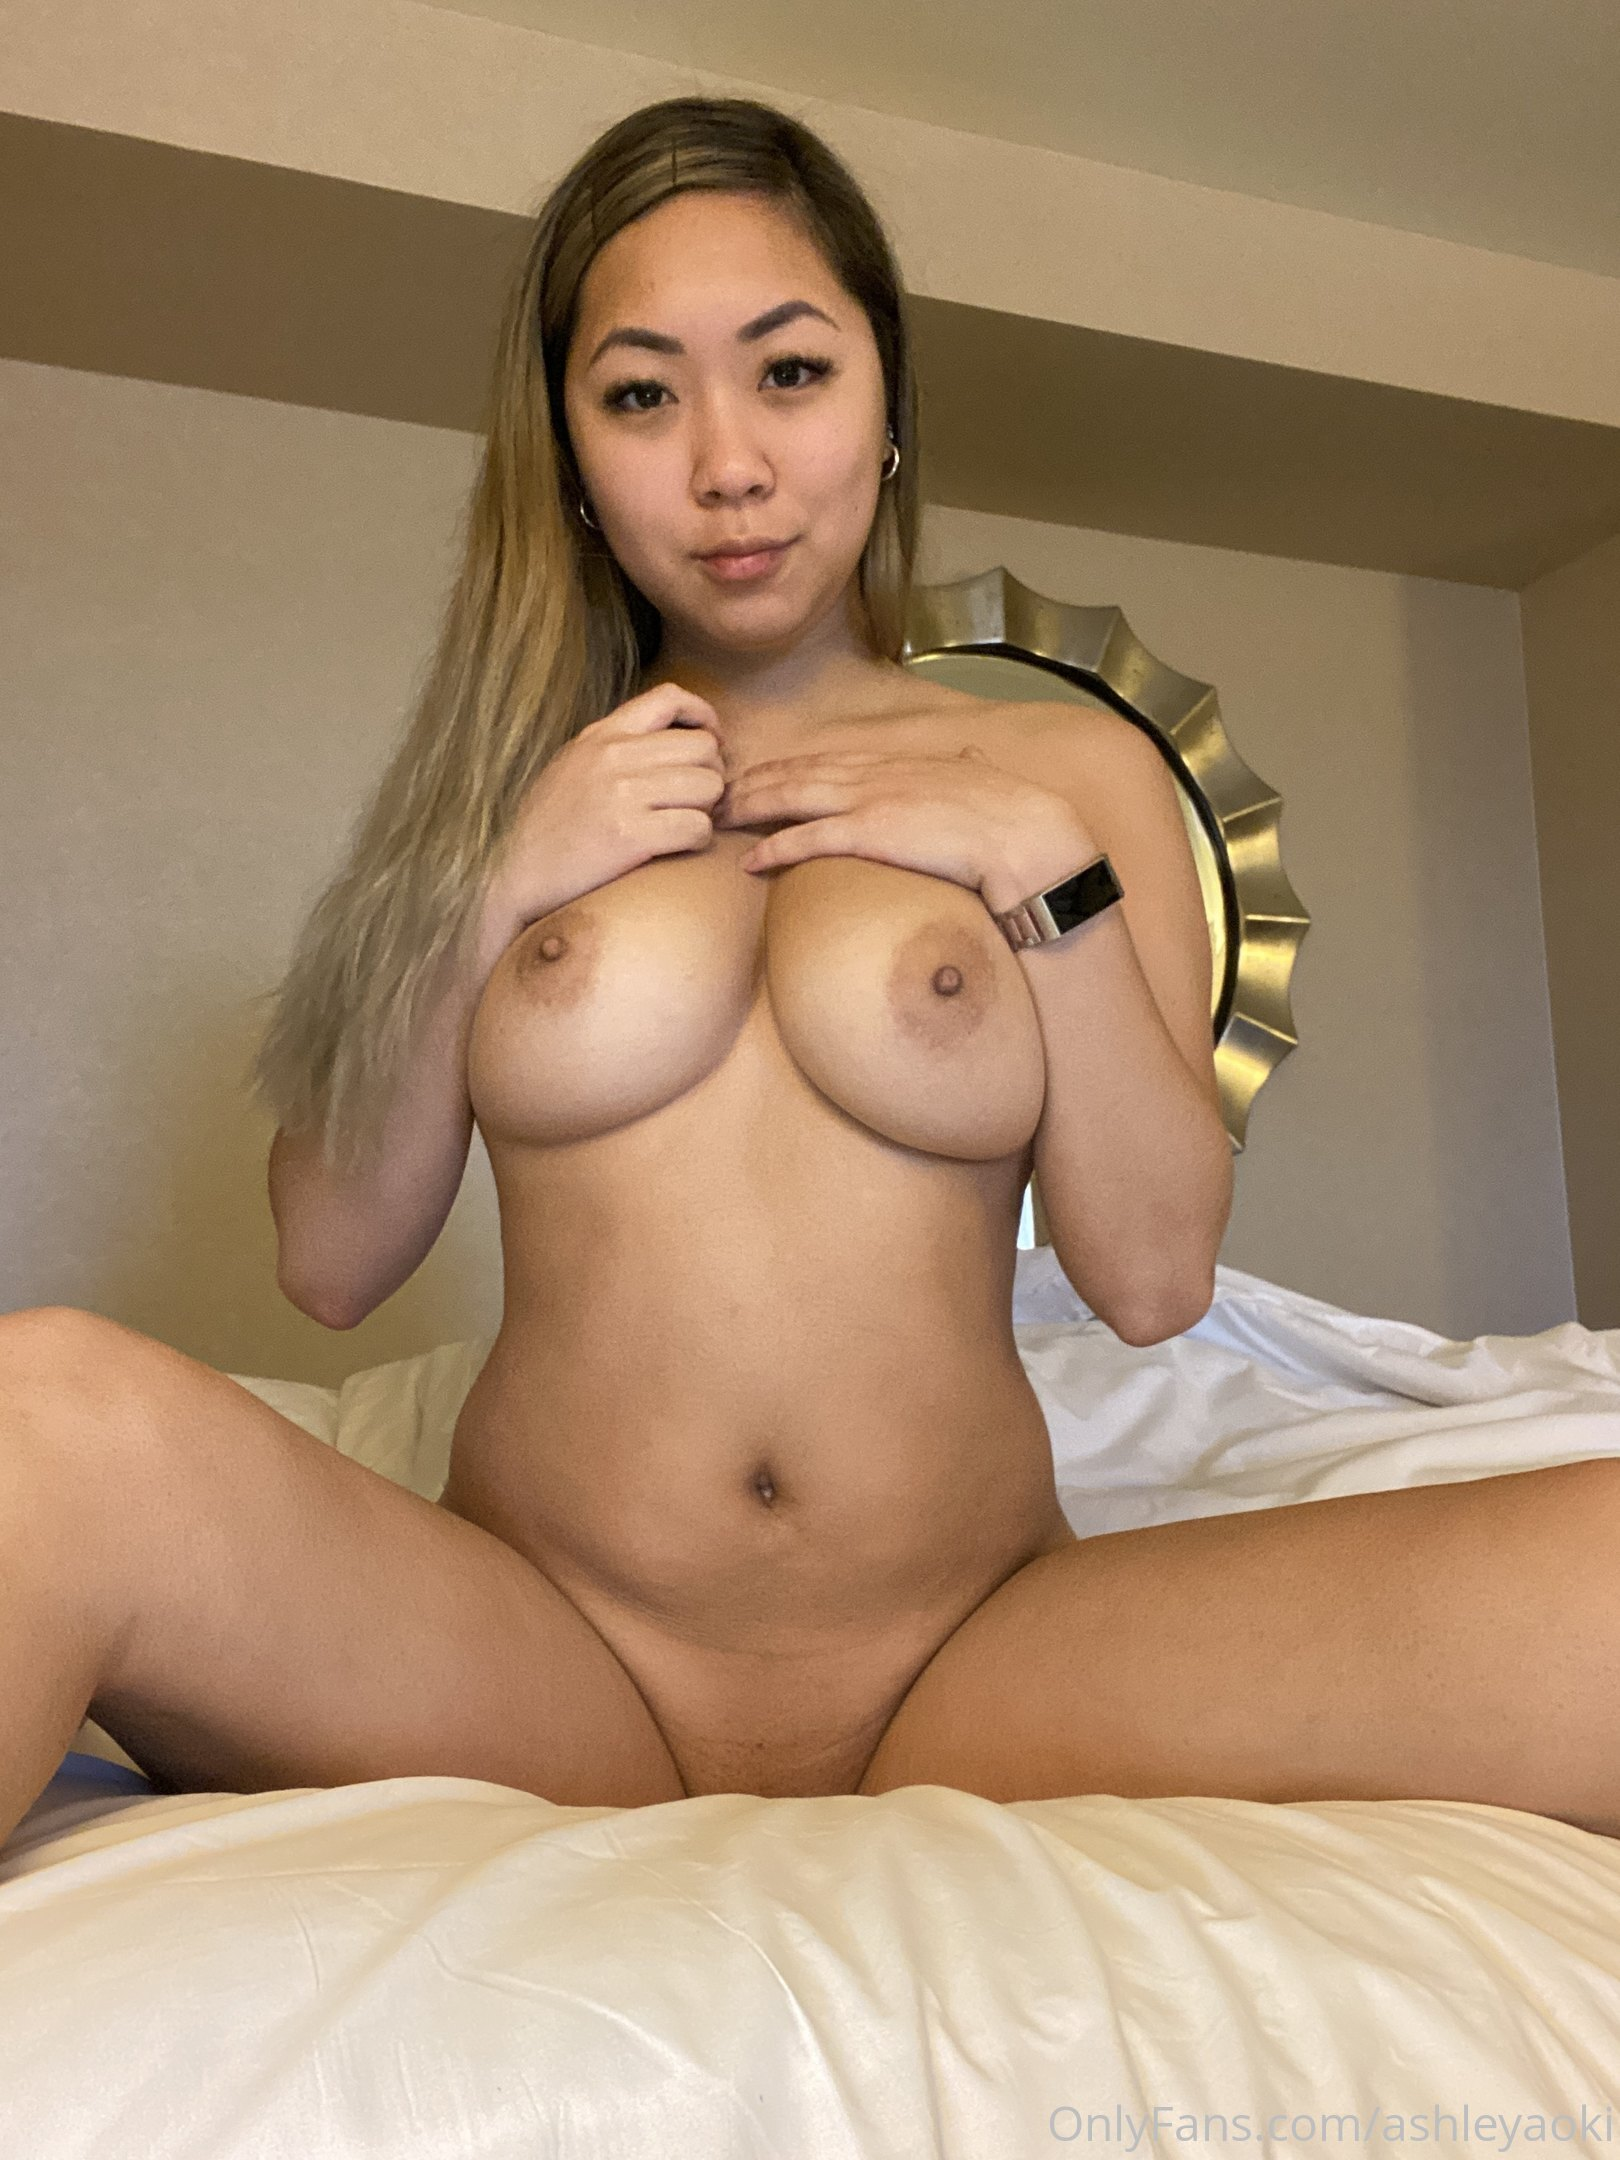 Ashley Aoki, Ashleyaoki, Onlyfans Leaks 0254